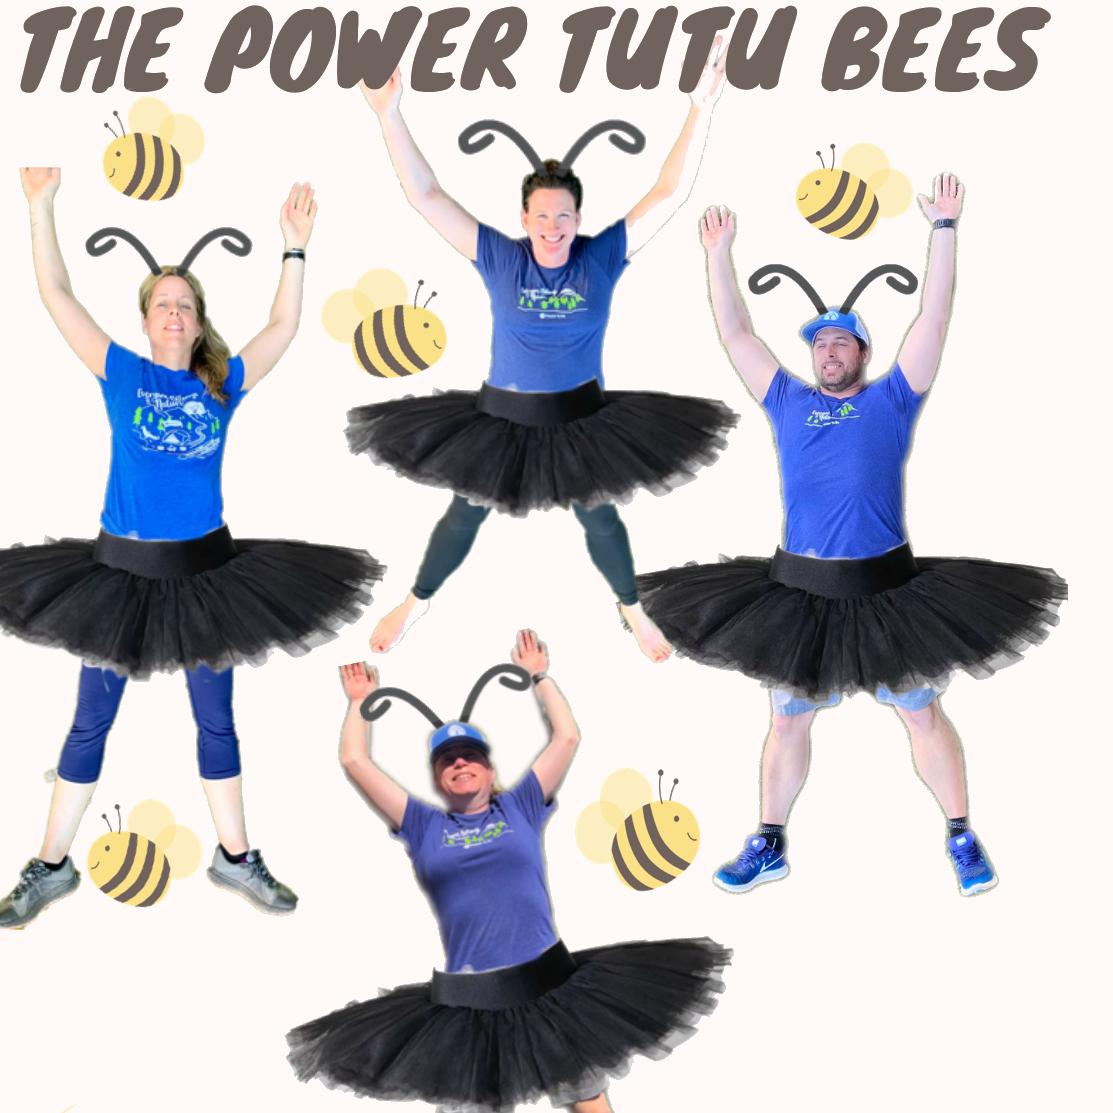 Power Tutu Bees